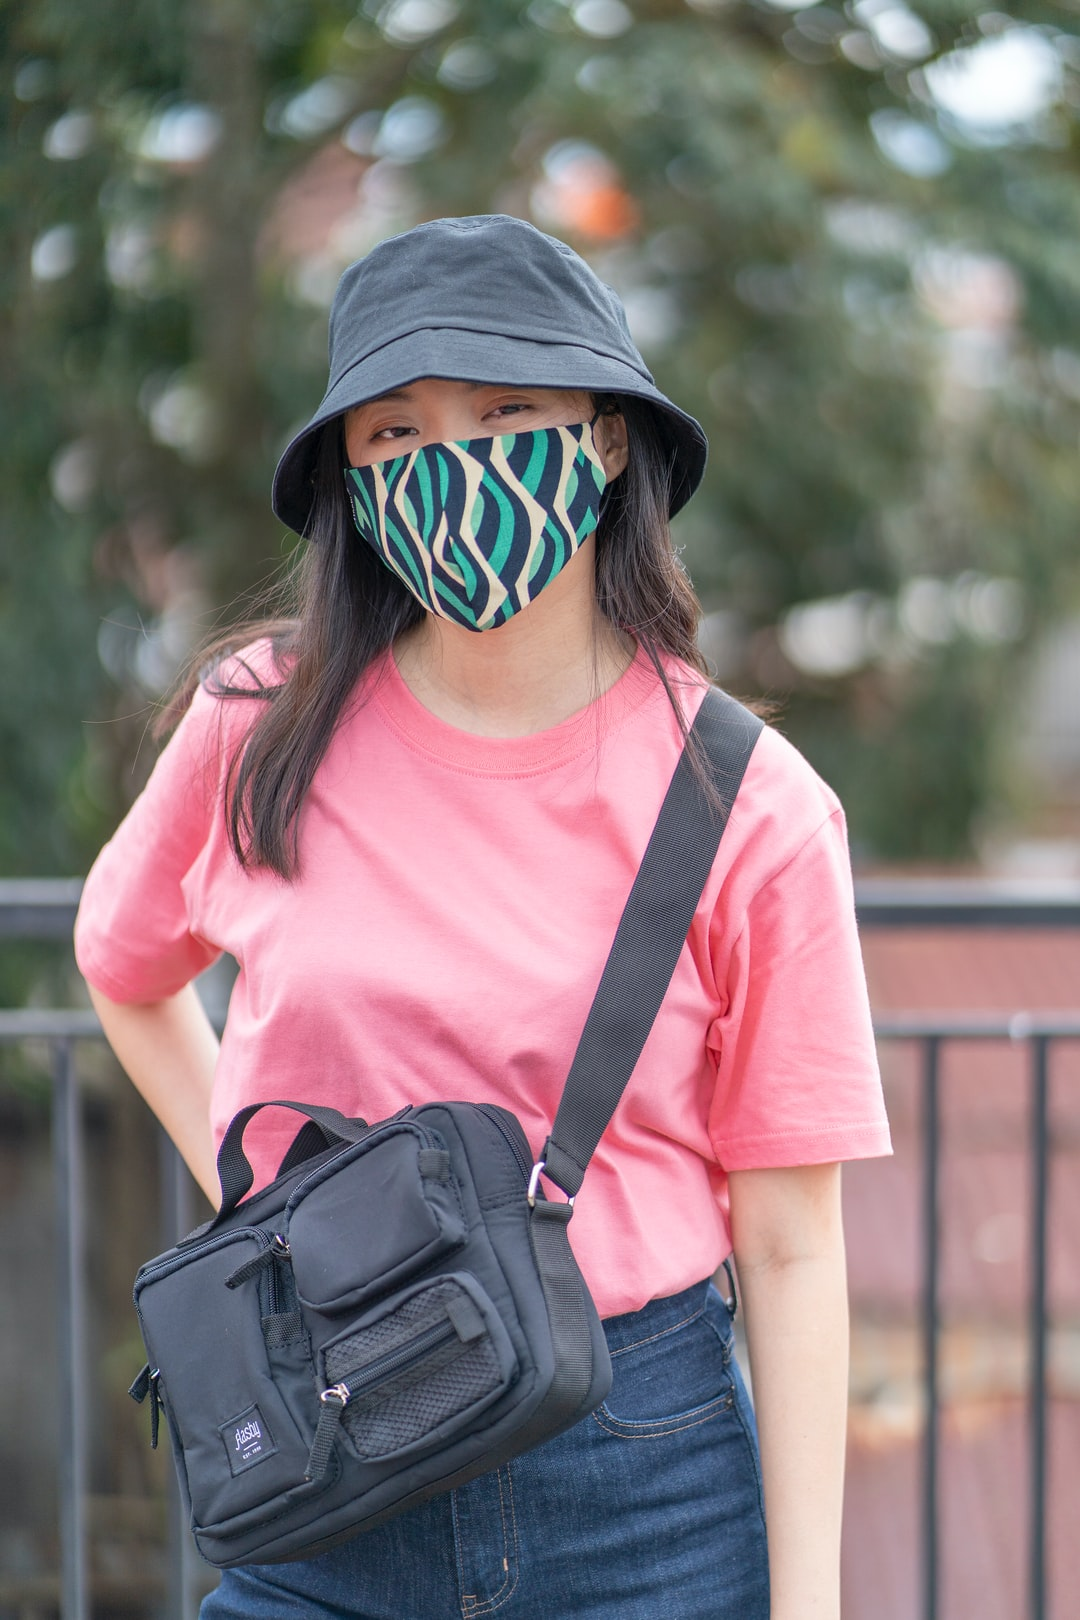 Fashion shoot during pandemic for Flashy Shop, Bandung - Indonesia.